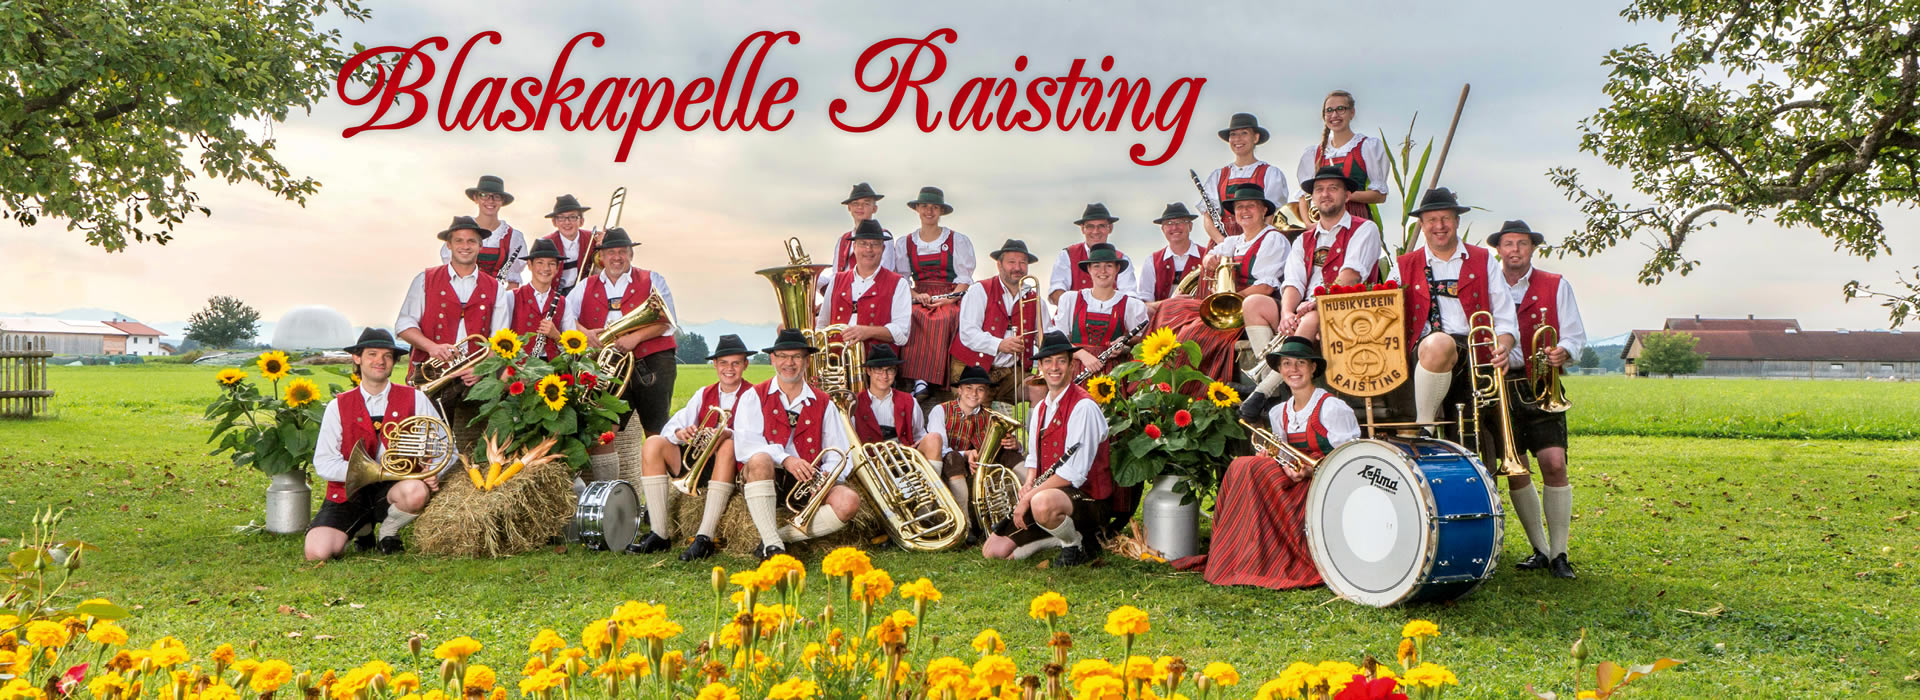 Blaskapelle Raisting Gruppenbild 2014